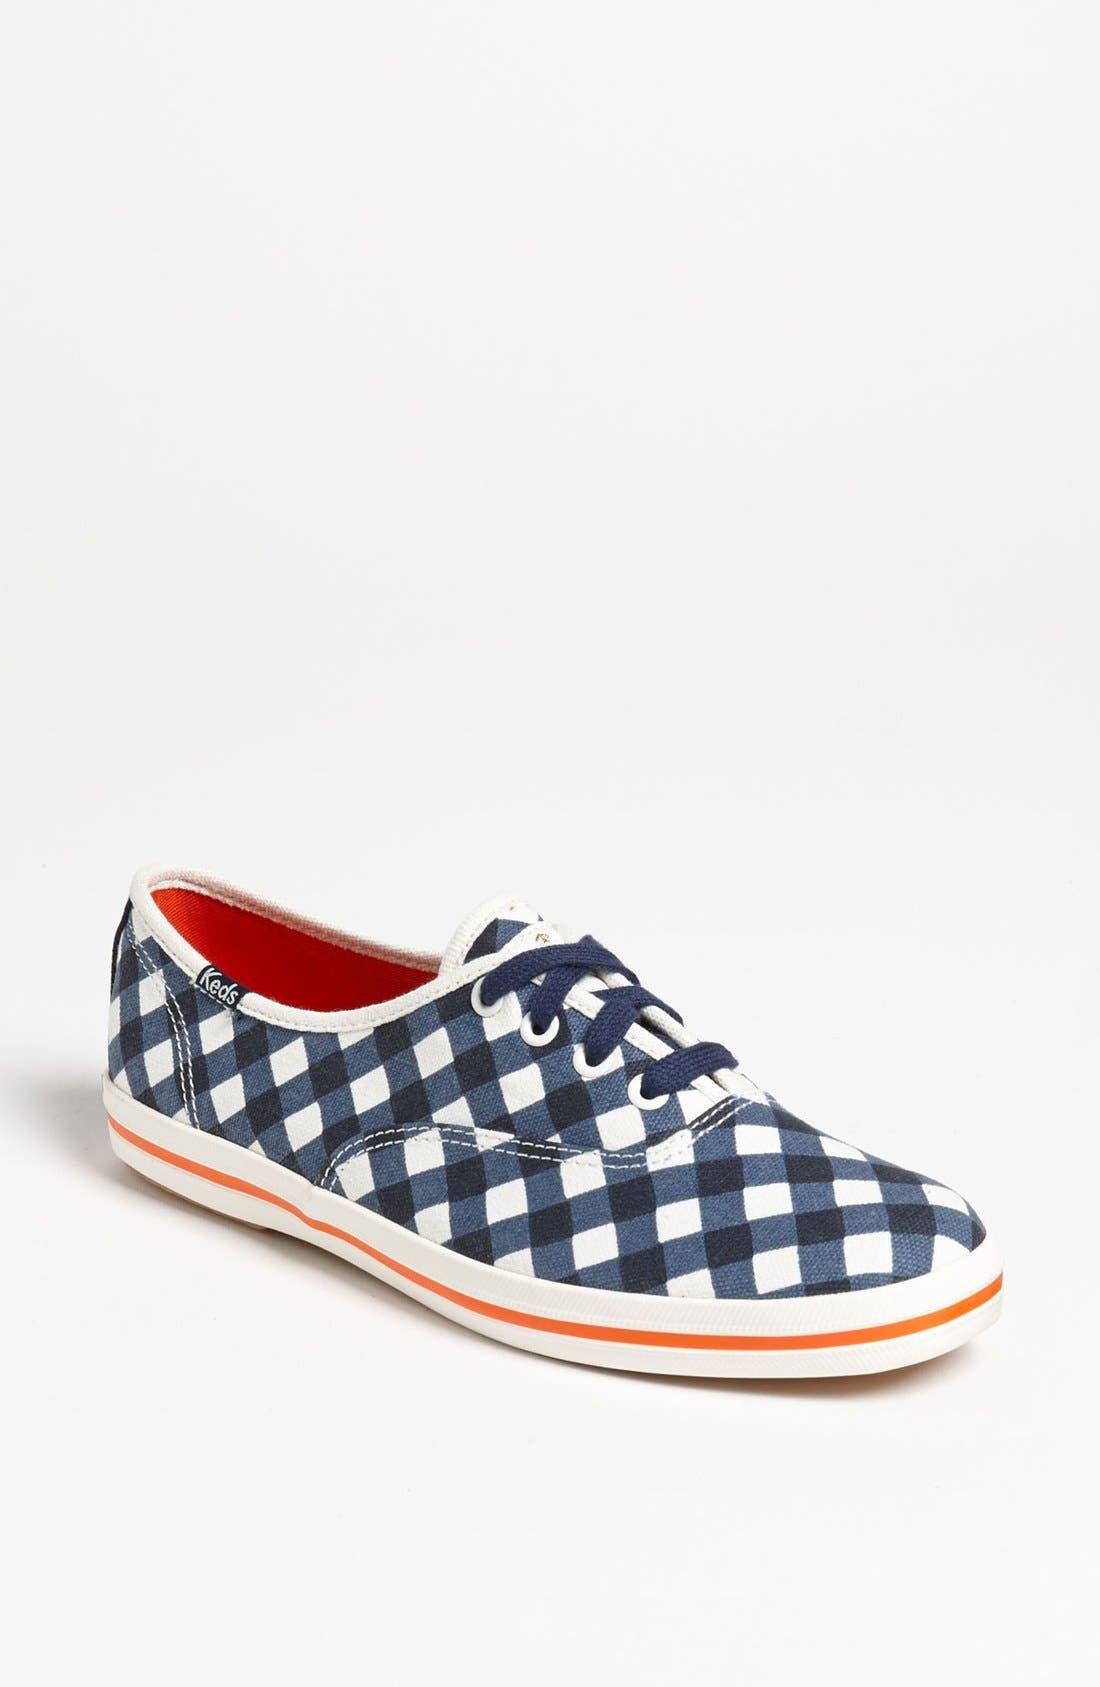 Main Image - Keds® for kate spade new york 'kick' sneaker